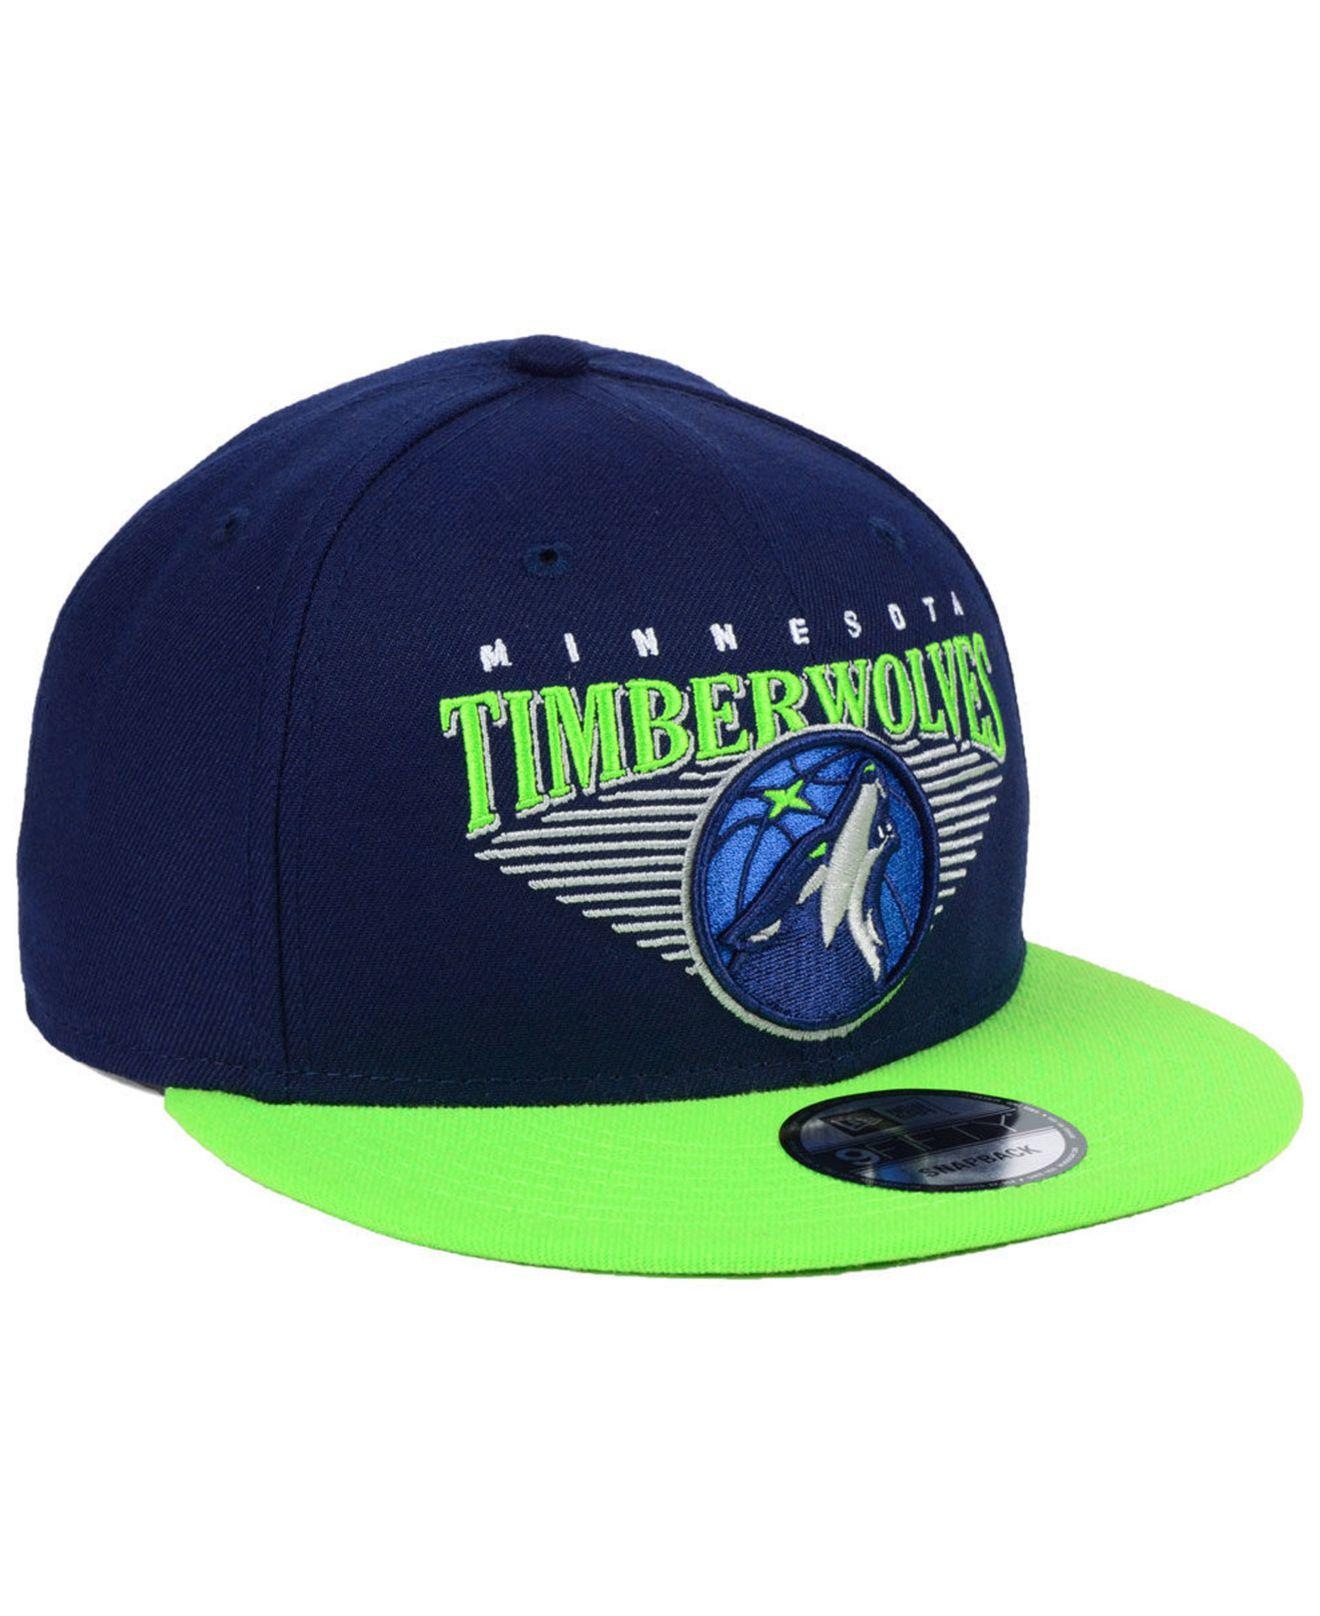 5fad797f8dd504 ... Minnesota Timberwolves Retro Triangle 9fifty Snapback Cap for Men -  Lyst. View fullscreen